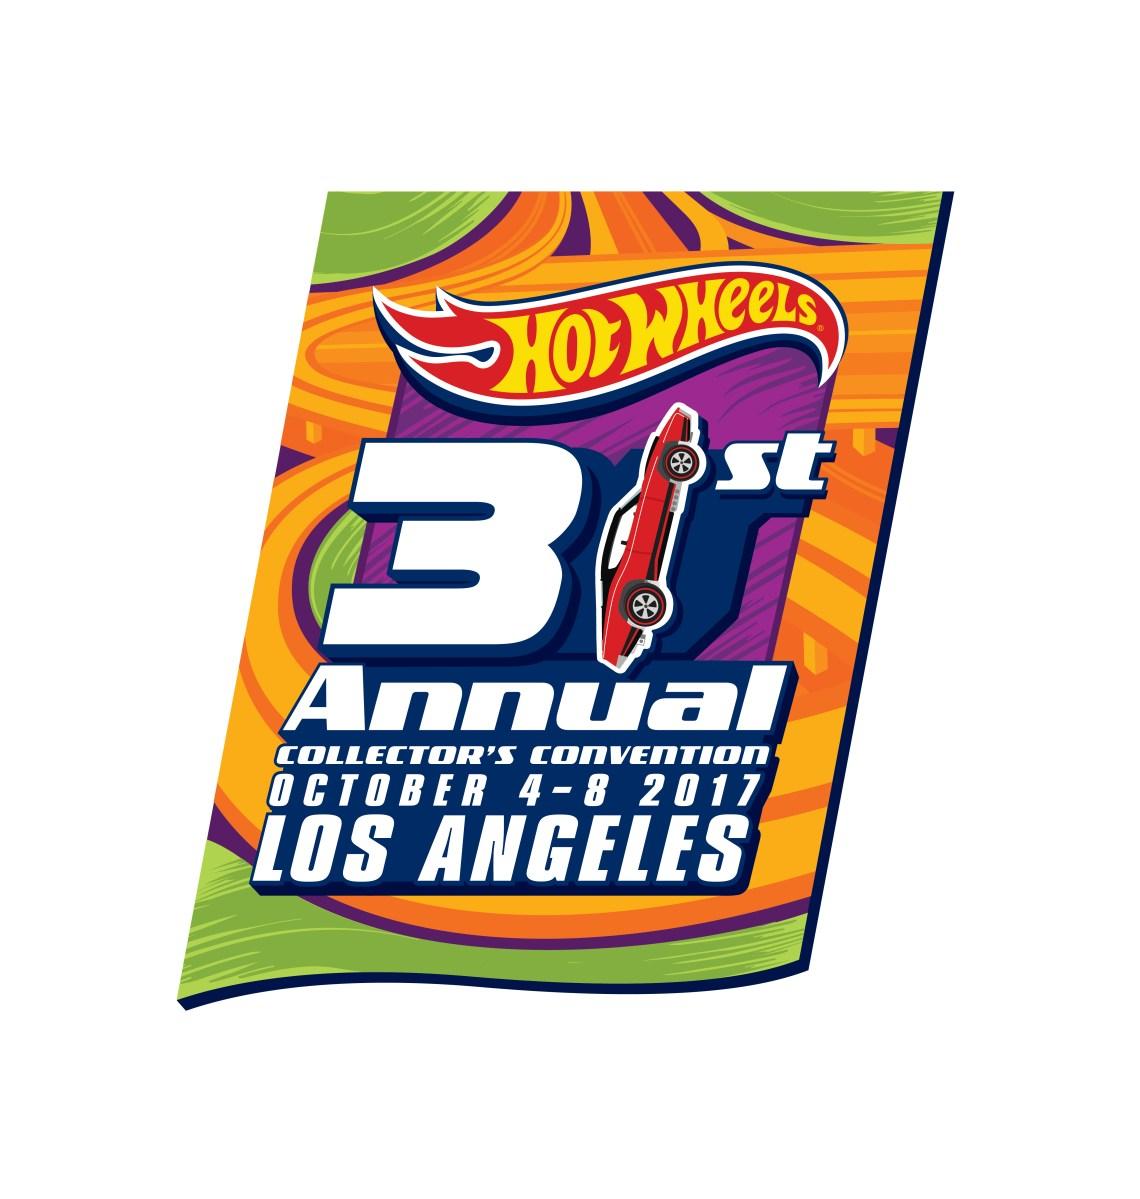 2017_HW_Collectors_Convention_Logo_FINAL-01